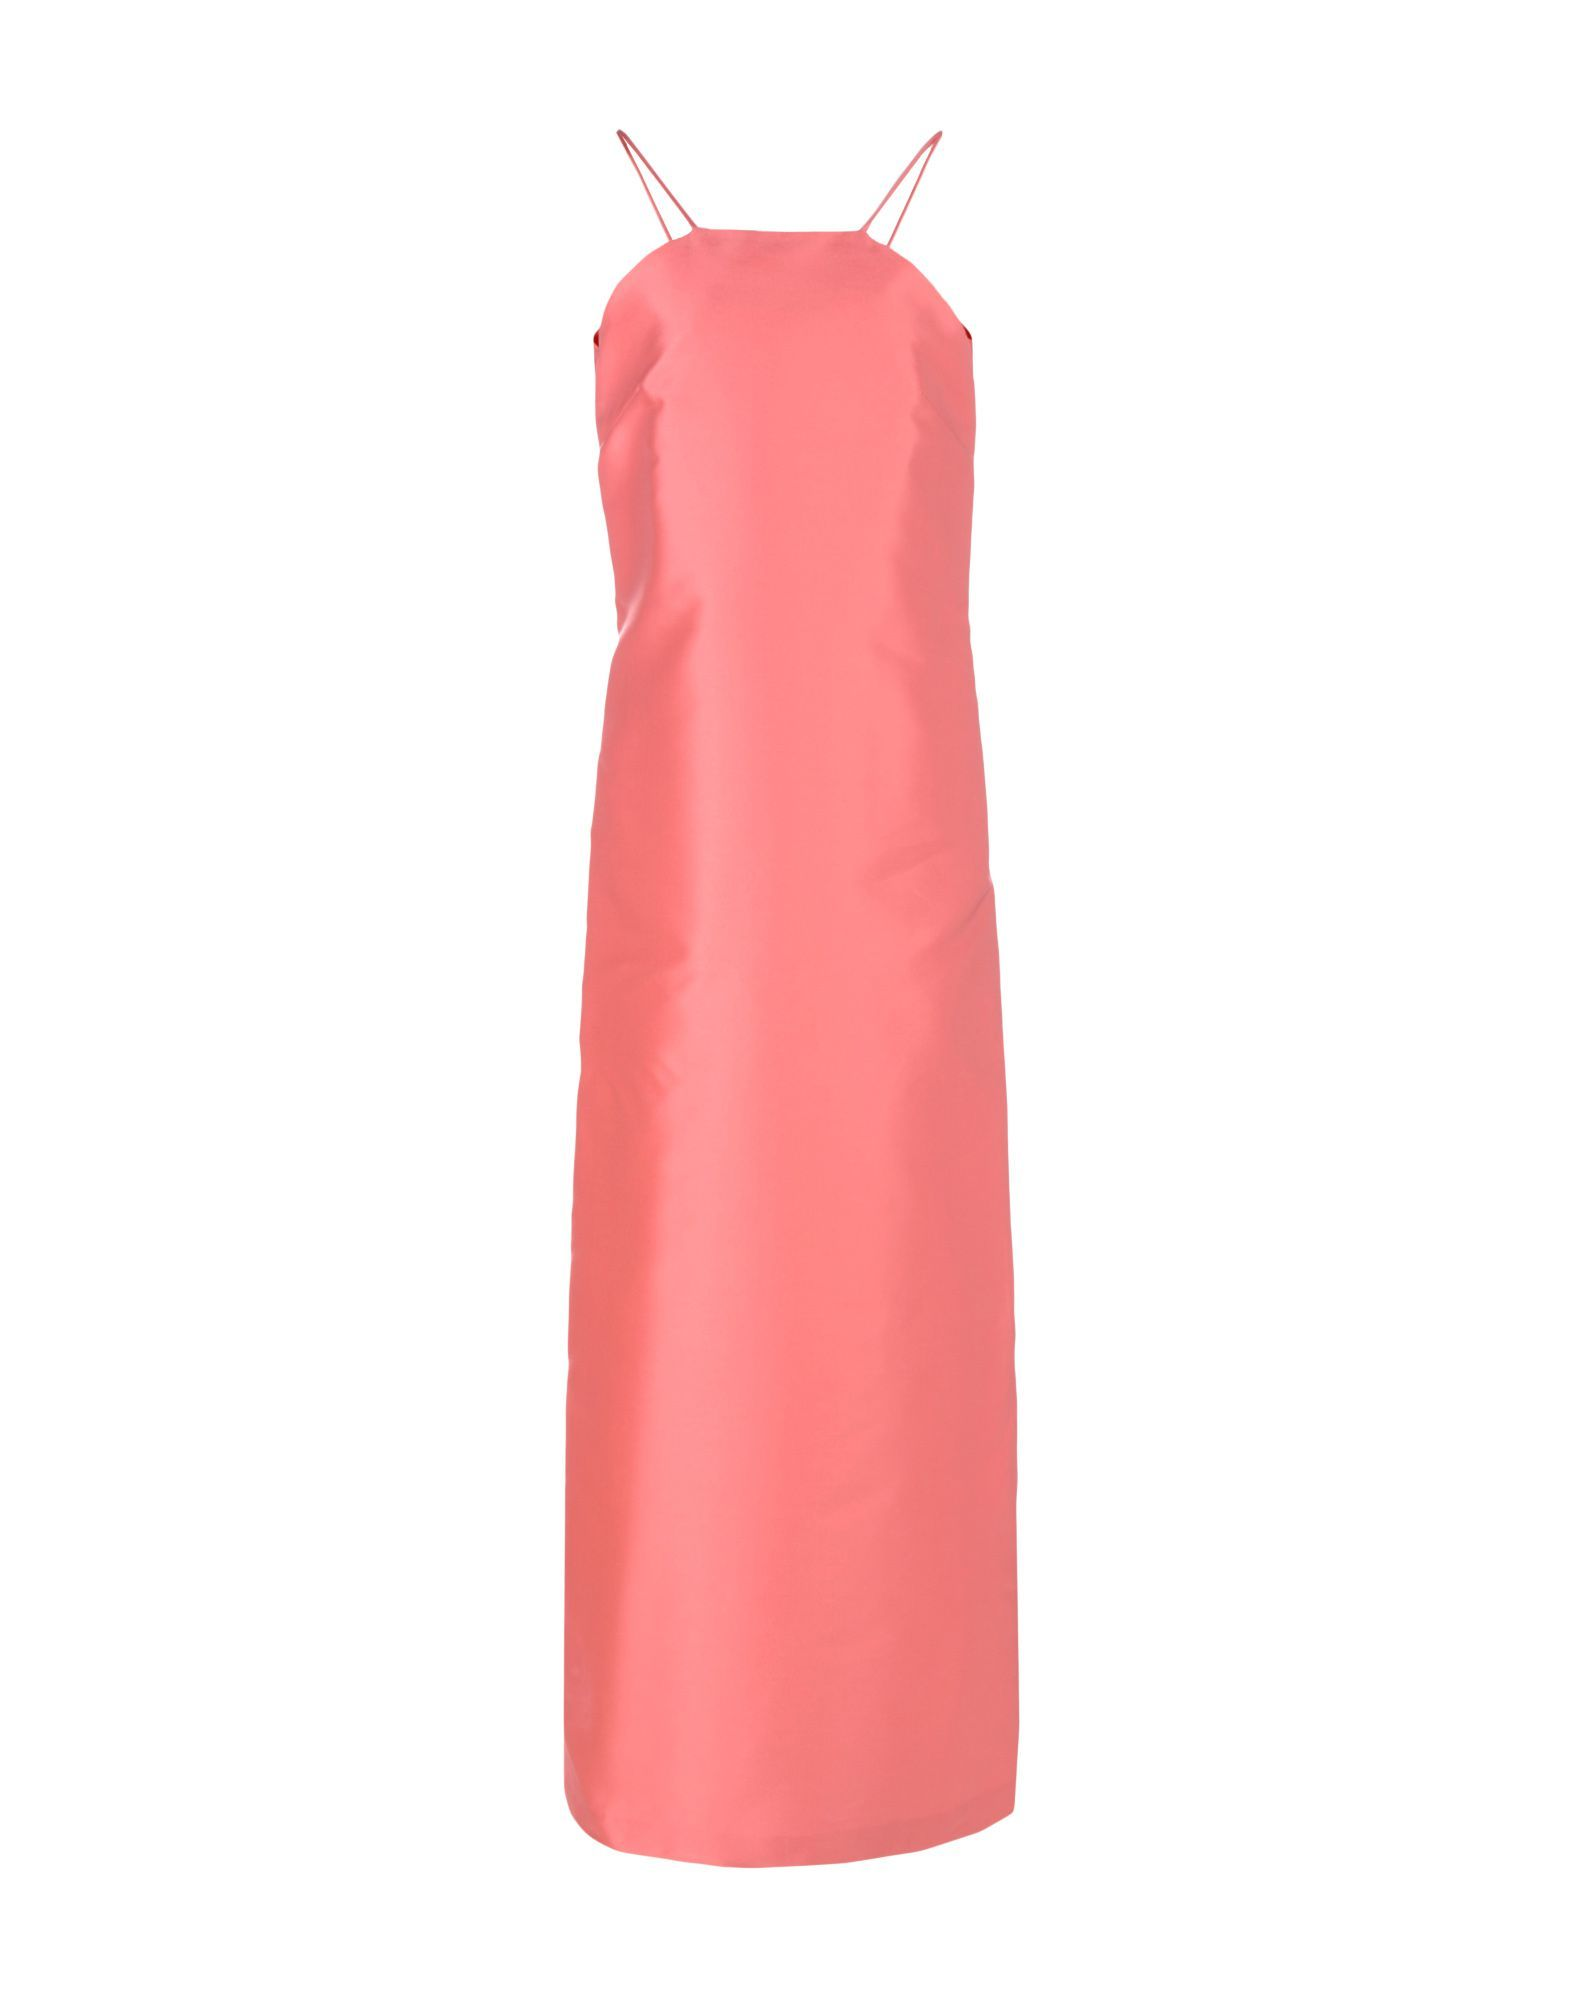 Dress Katia Giannini Pink Women's Polyester